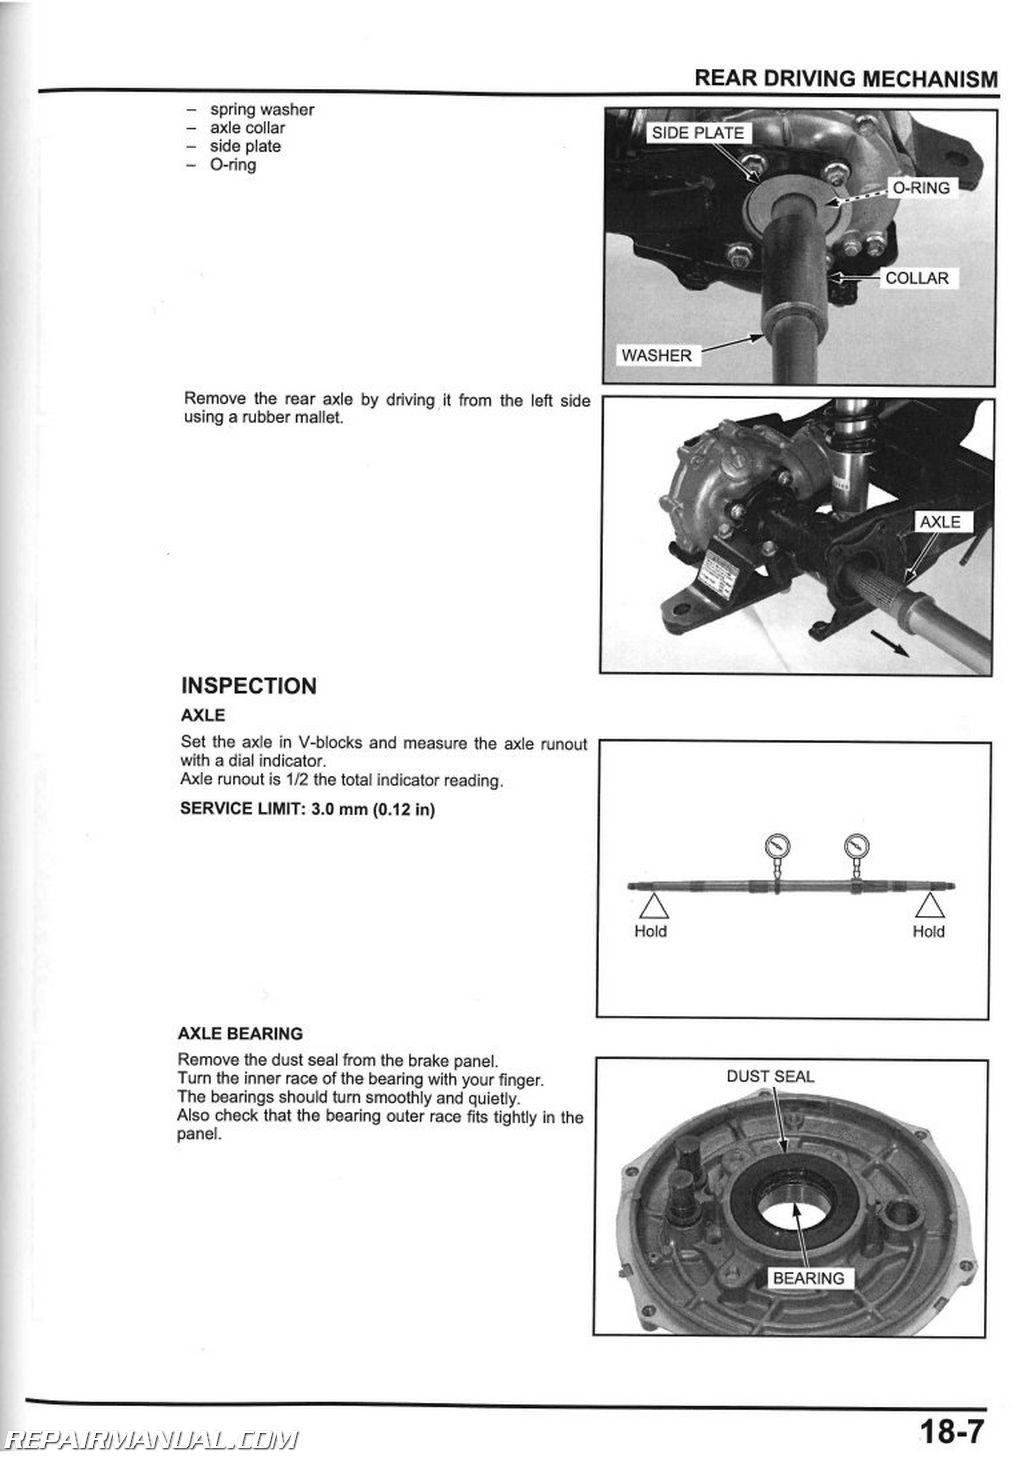 honda rancher 420 shift angle sensor diagram  honda  free